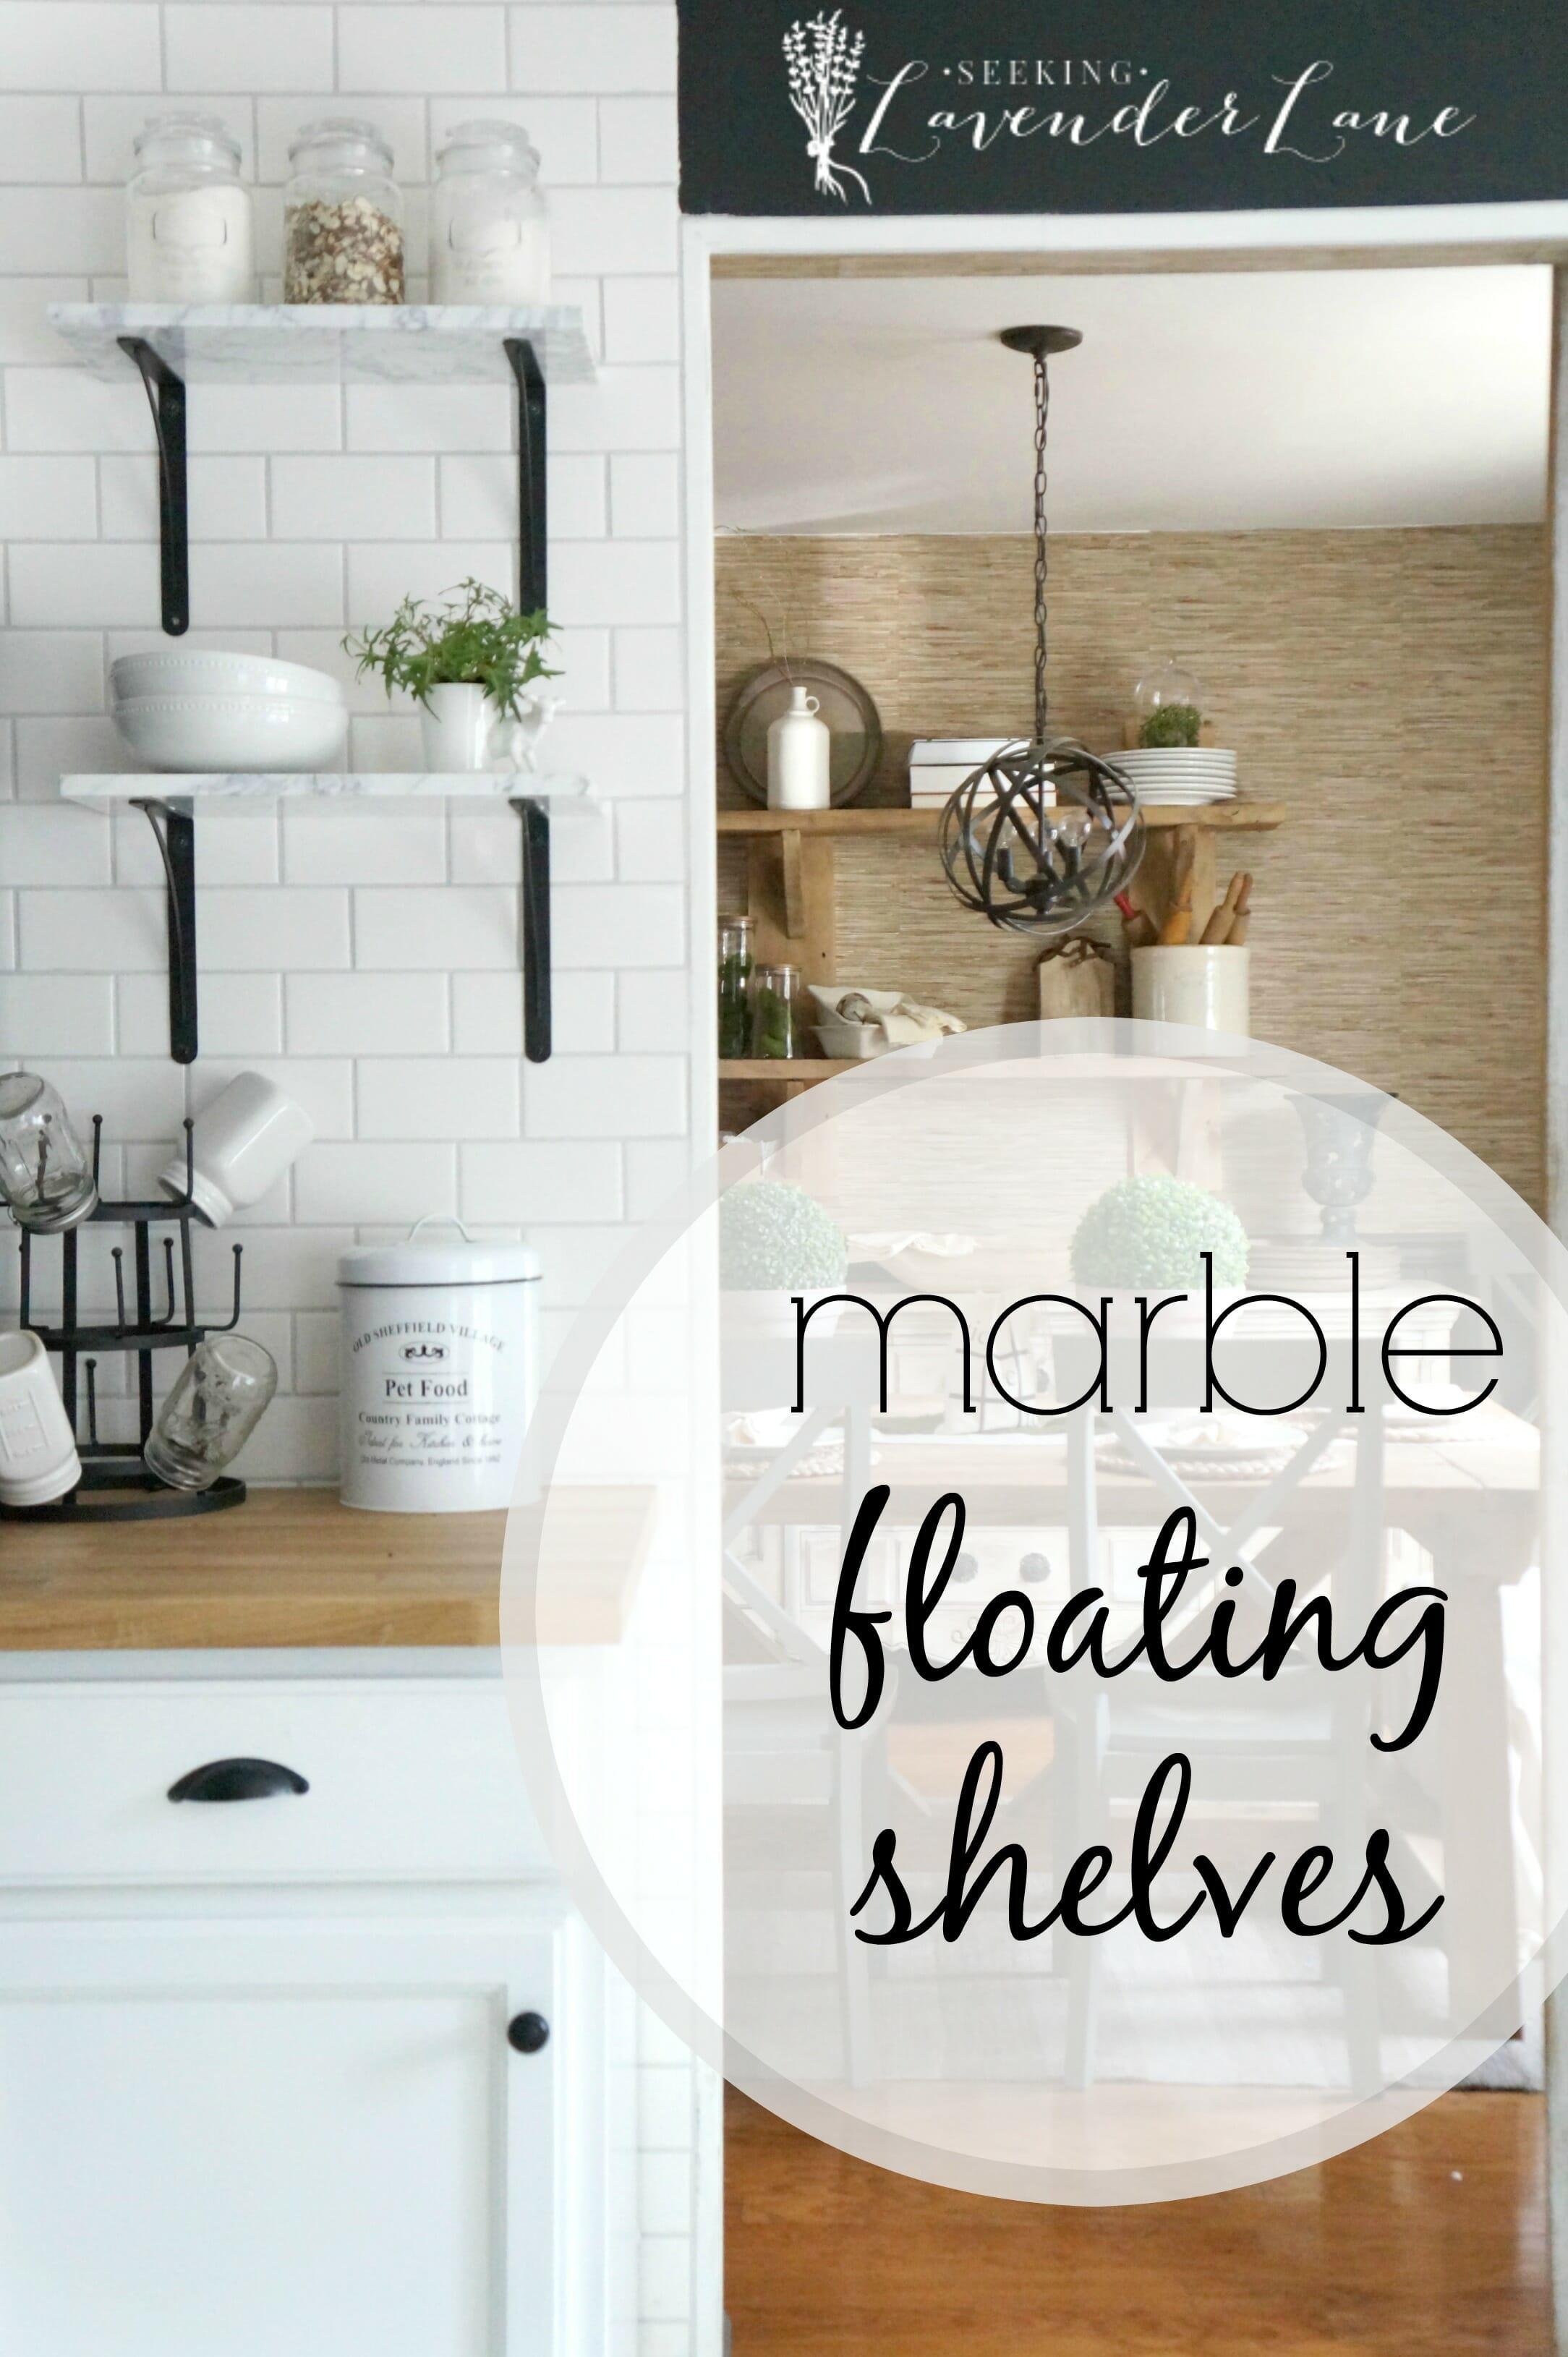 Week 3 Orc Marble Floating Shelves Seeking Lavendar Lane